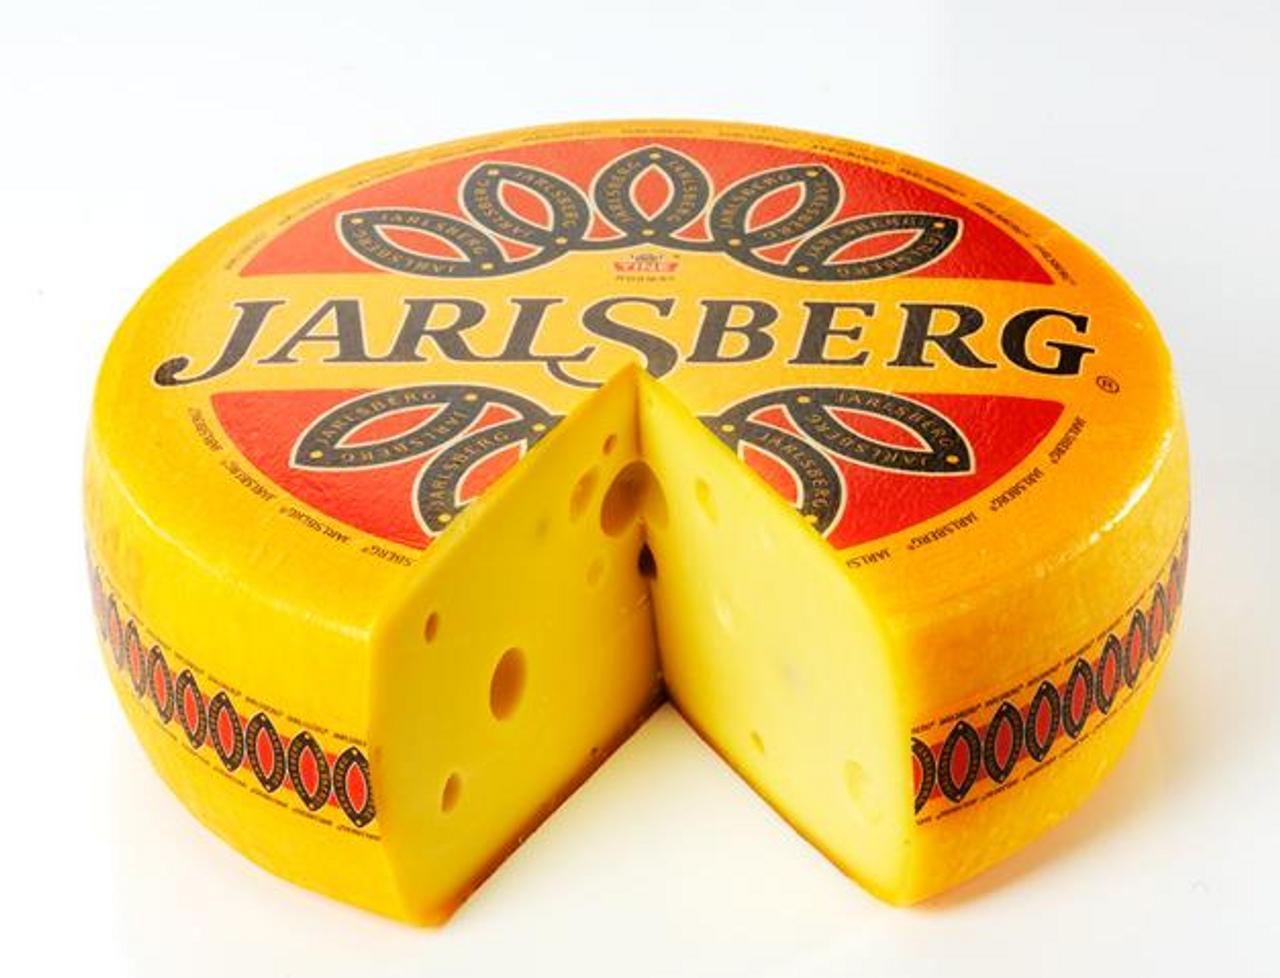 Norwegian Jarlsberg